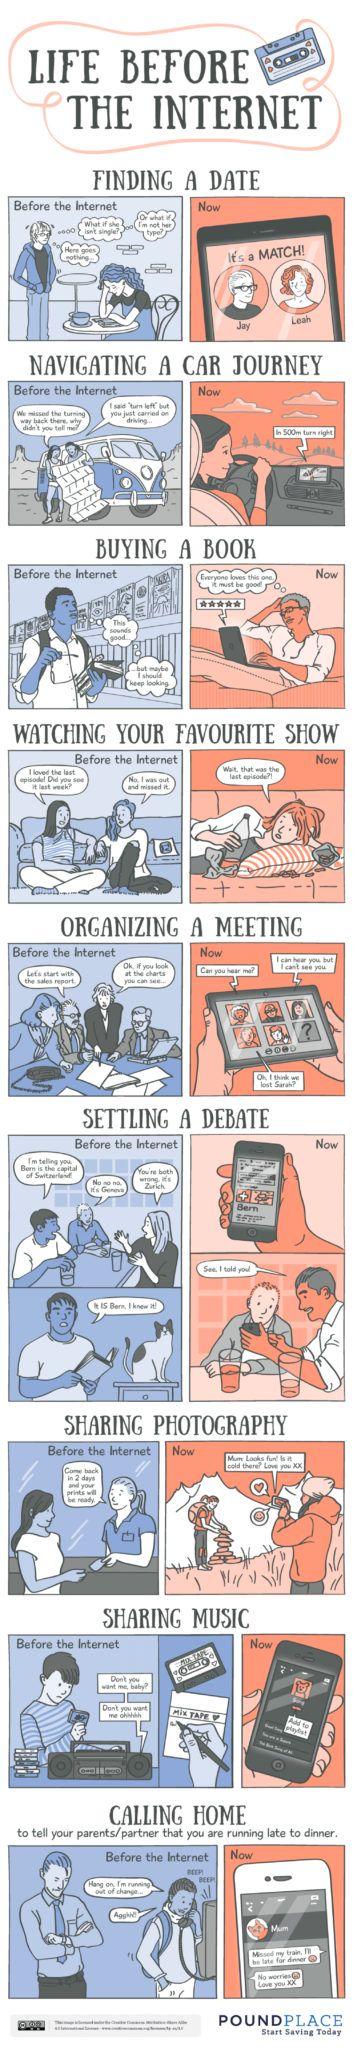 Era przed internetem vs era po internecie